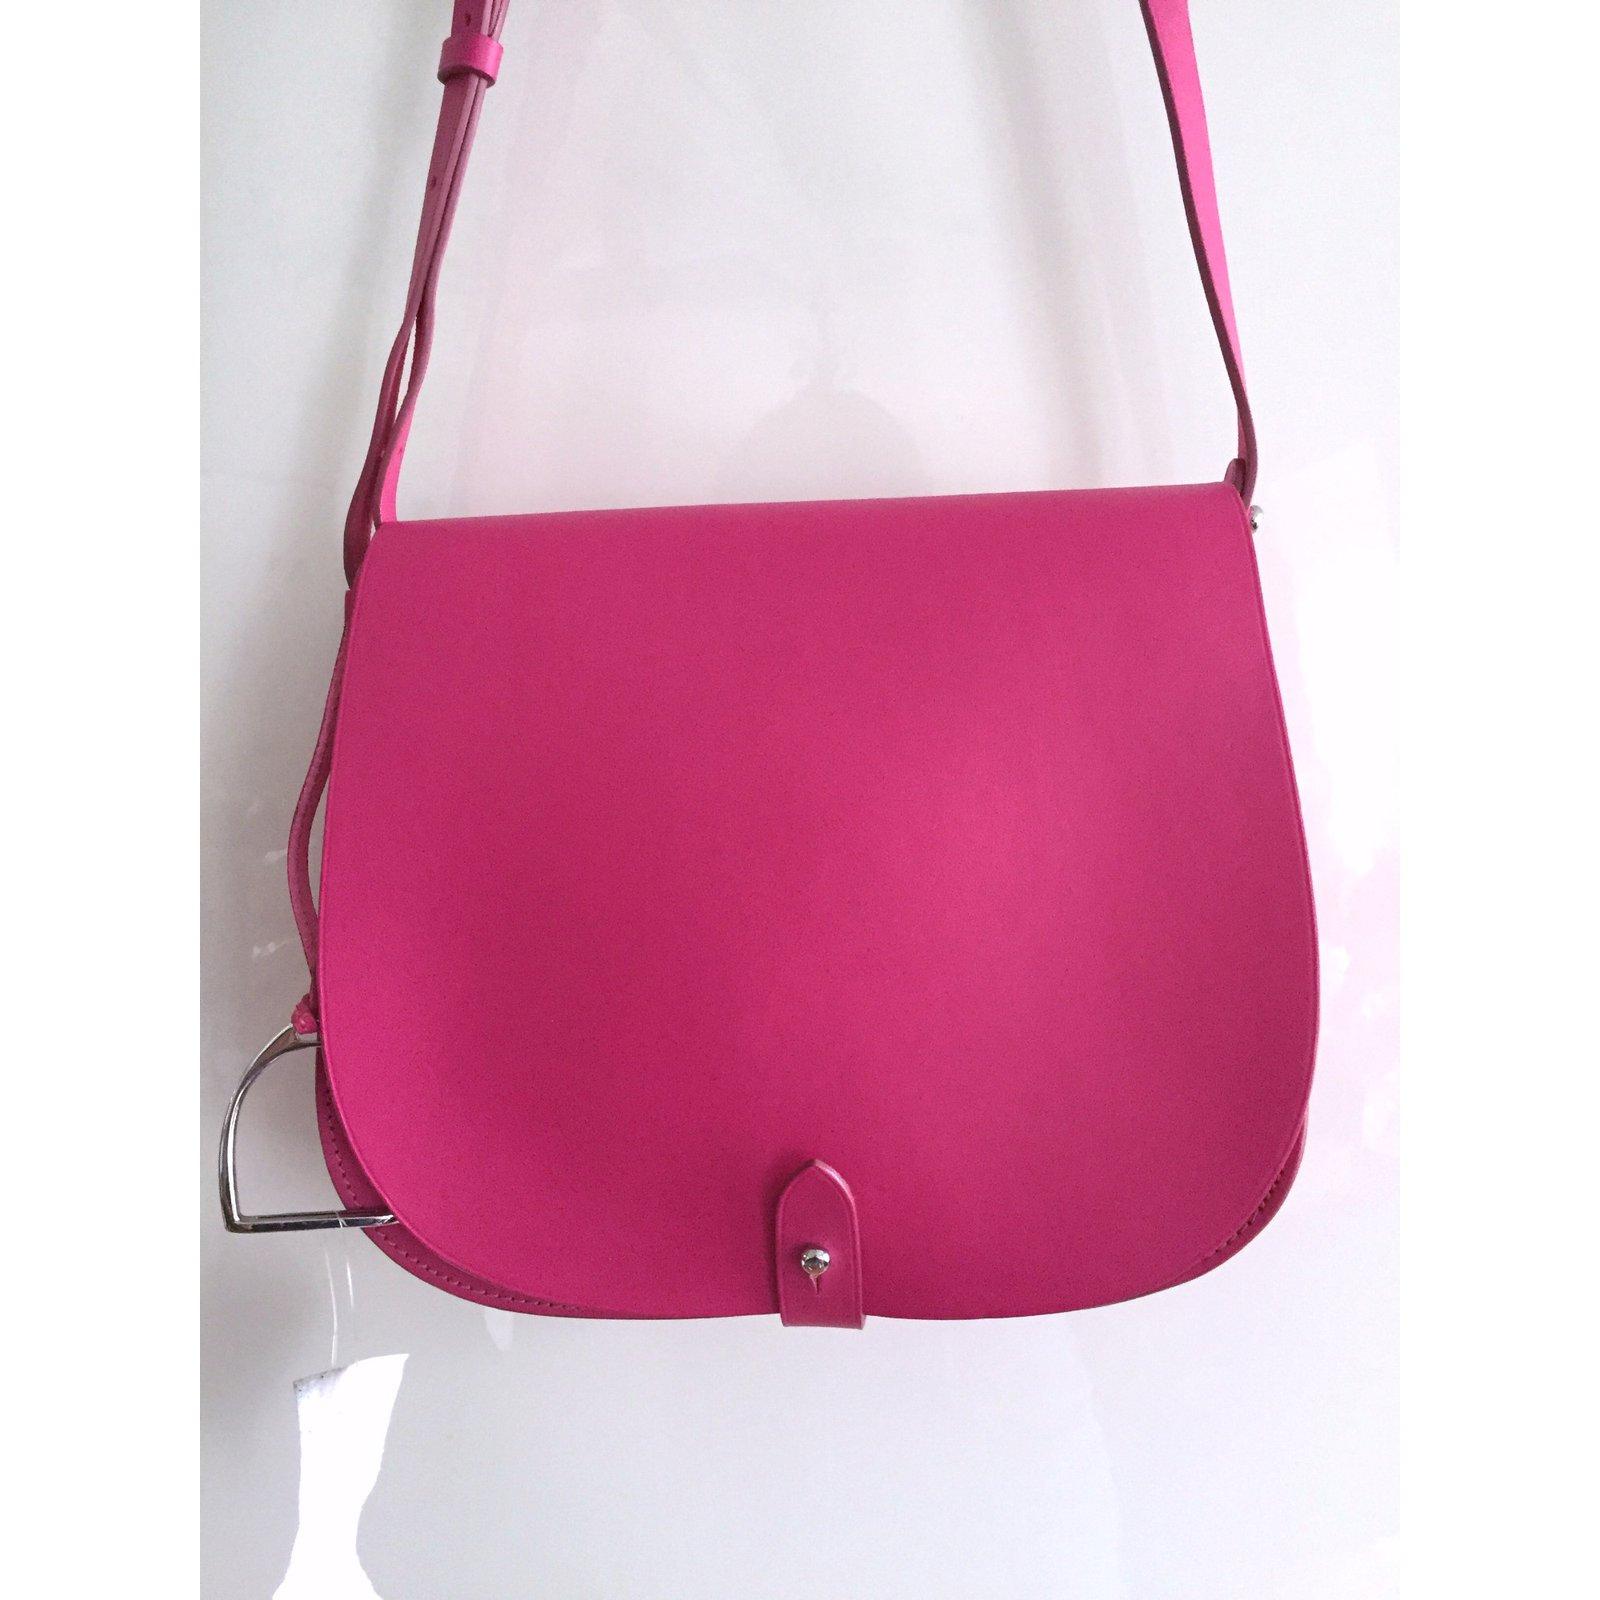 Ralph Lauren Collection Handbags Handbags Leather Pink ref.8398 - Joli  Closet 1de81babb1